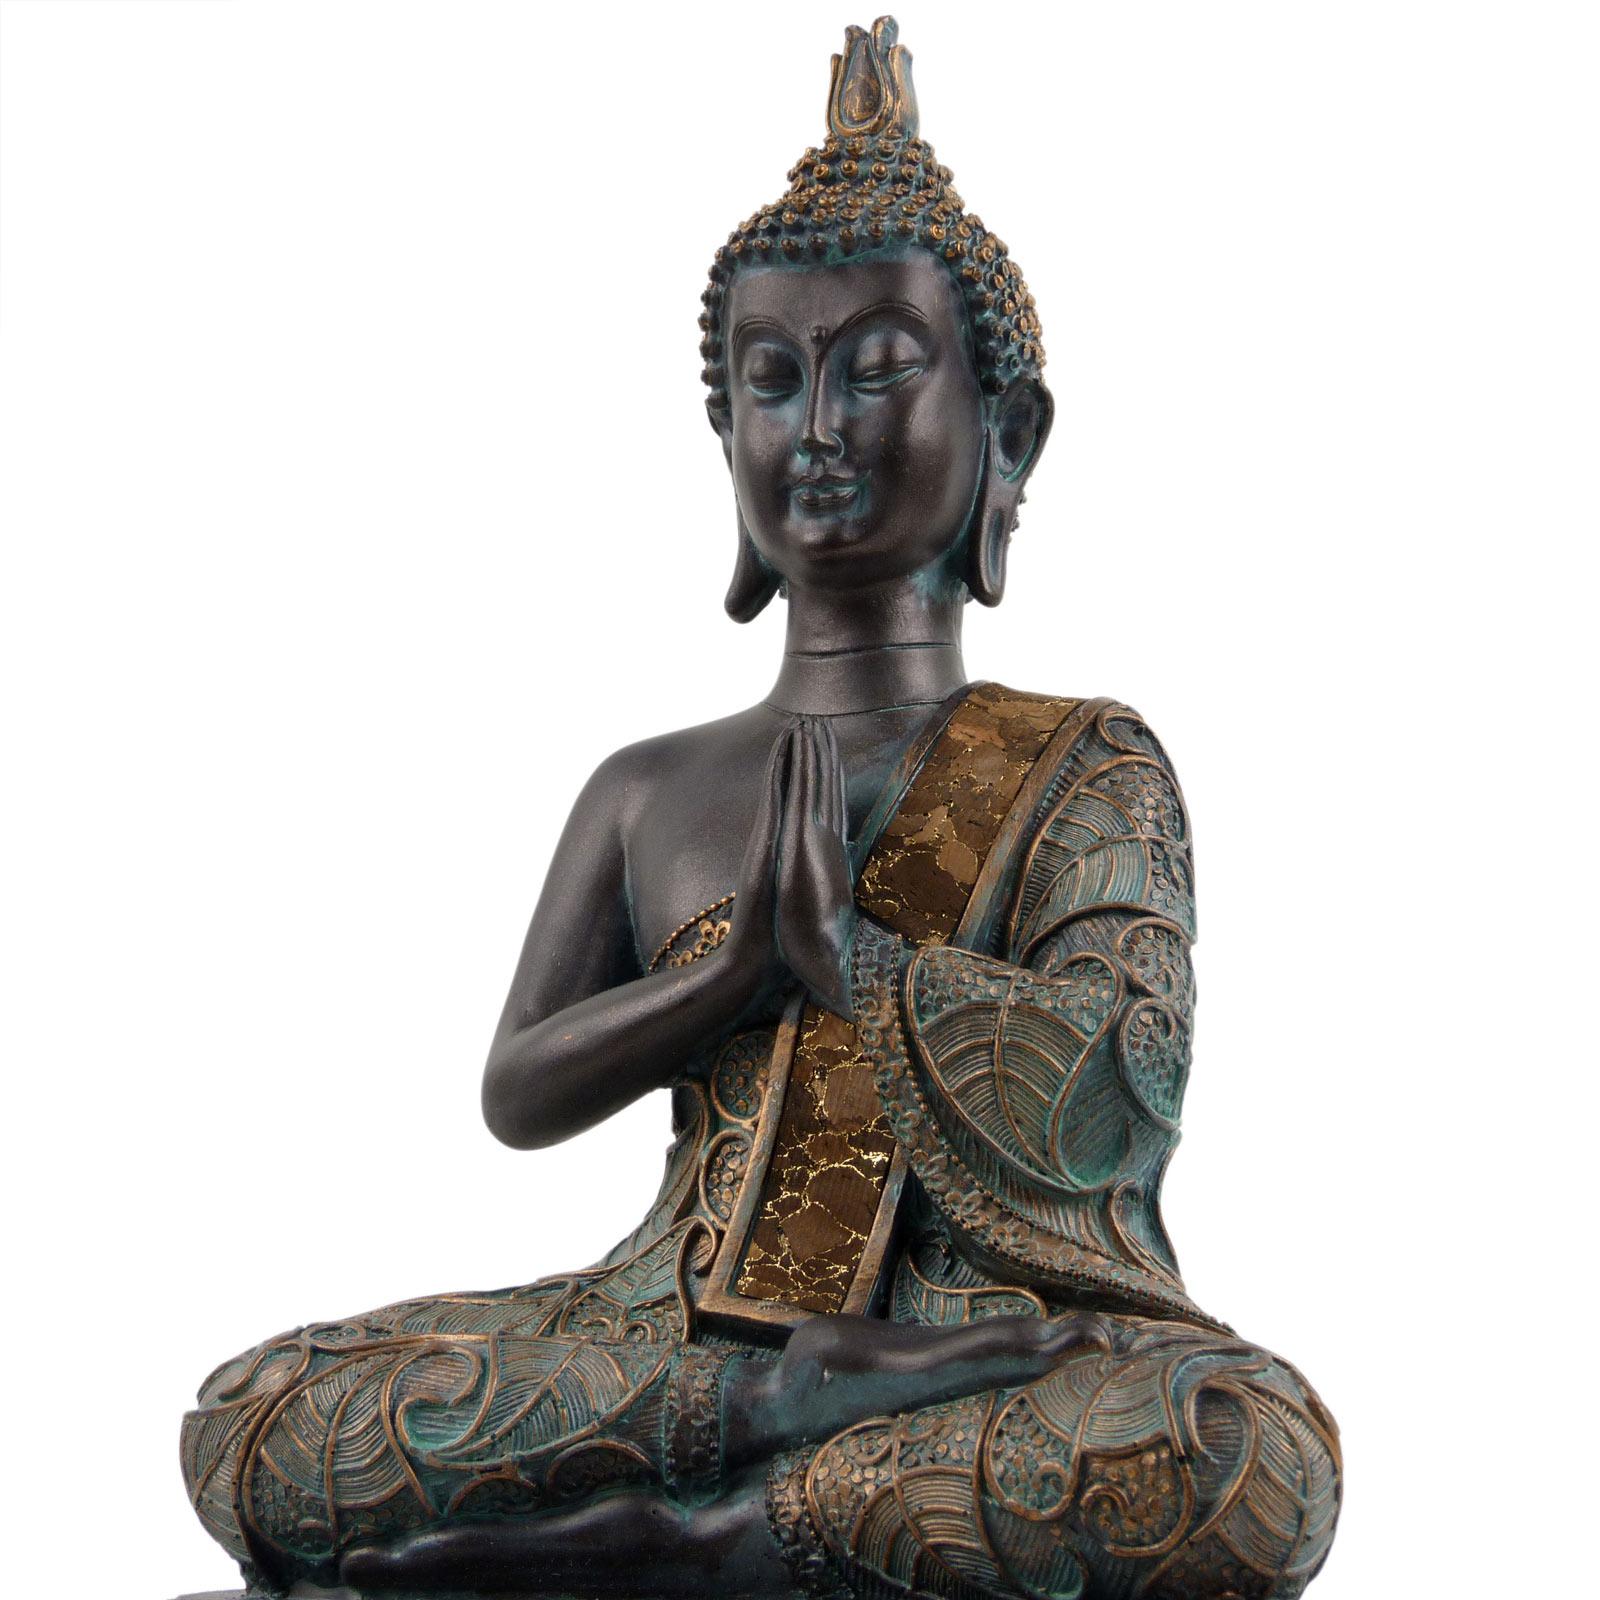 Verdin-Buda-Tailandes-23cm-Alto-4-Disenos-Meditacion-Mindfulness-Metta miniatura 5